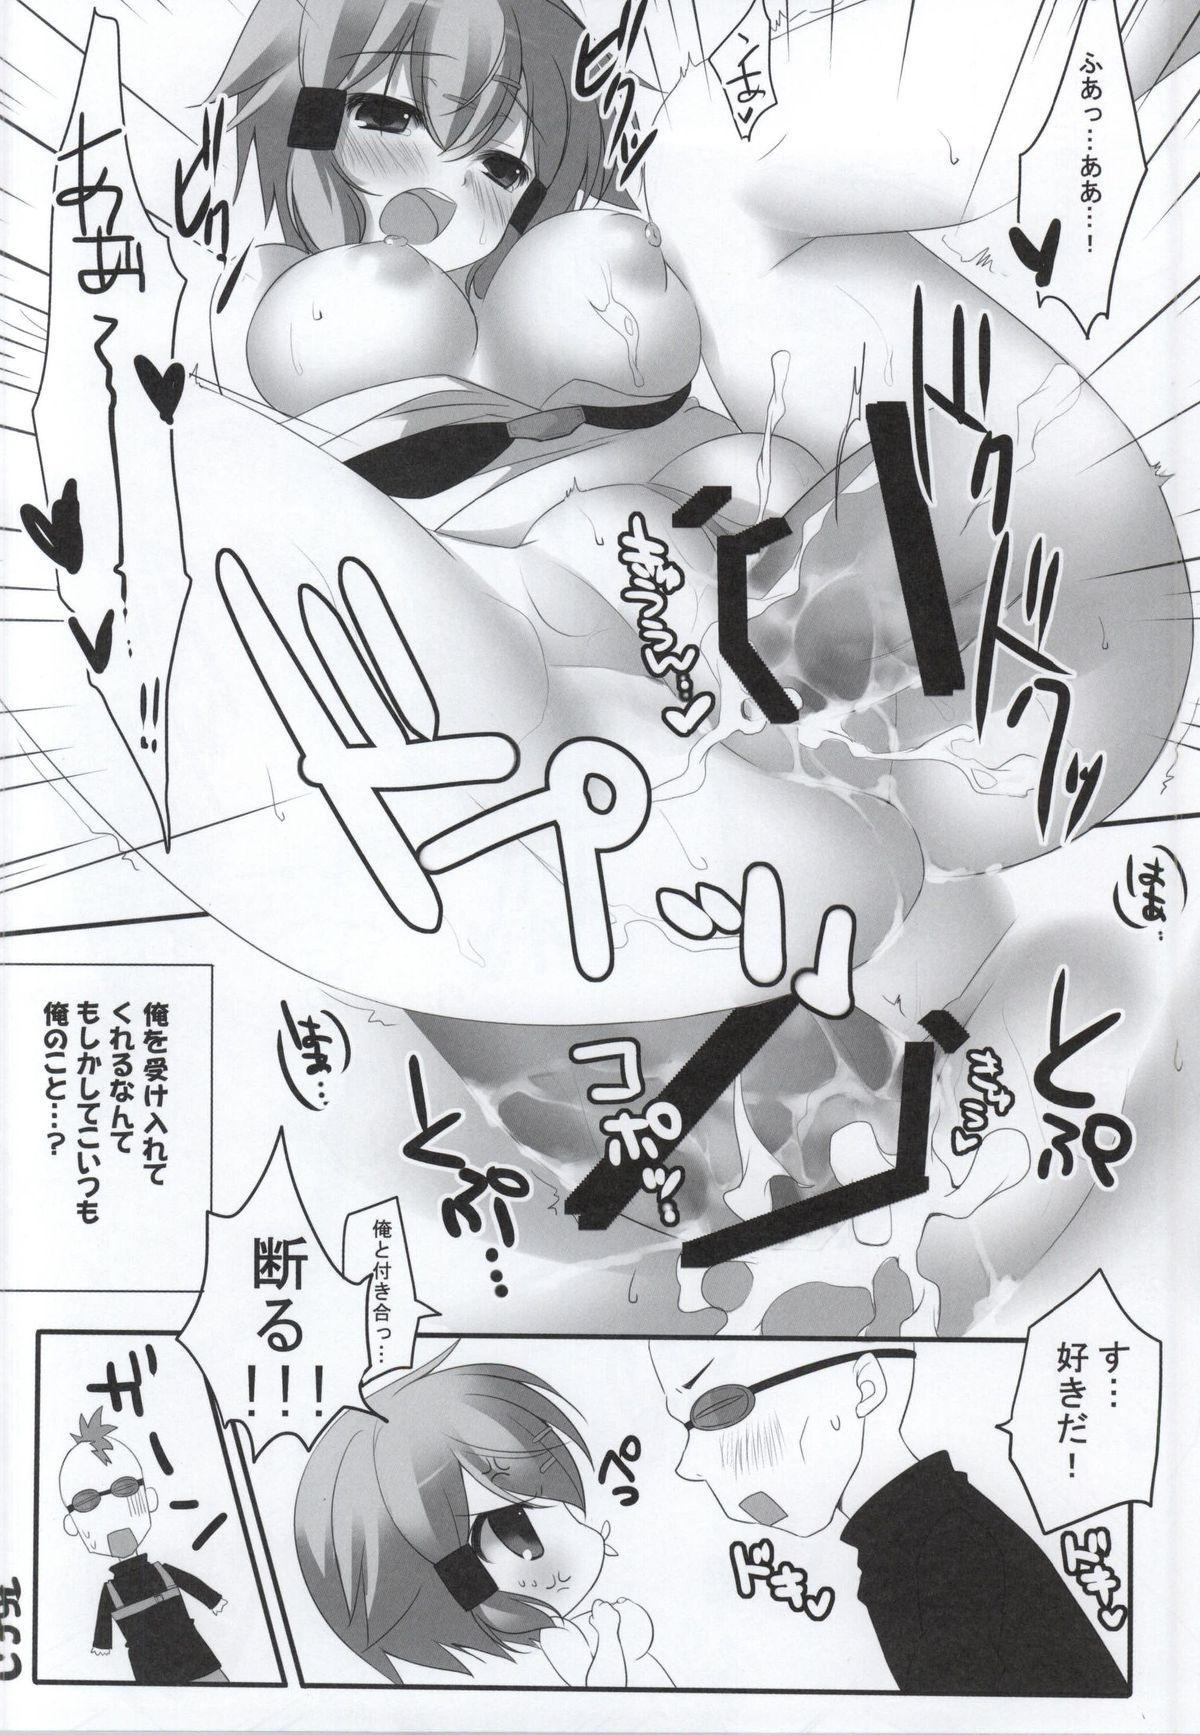 Himitsu no Online 8